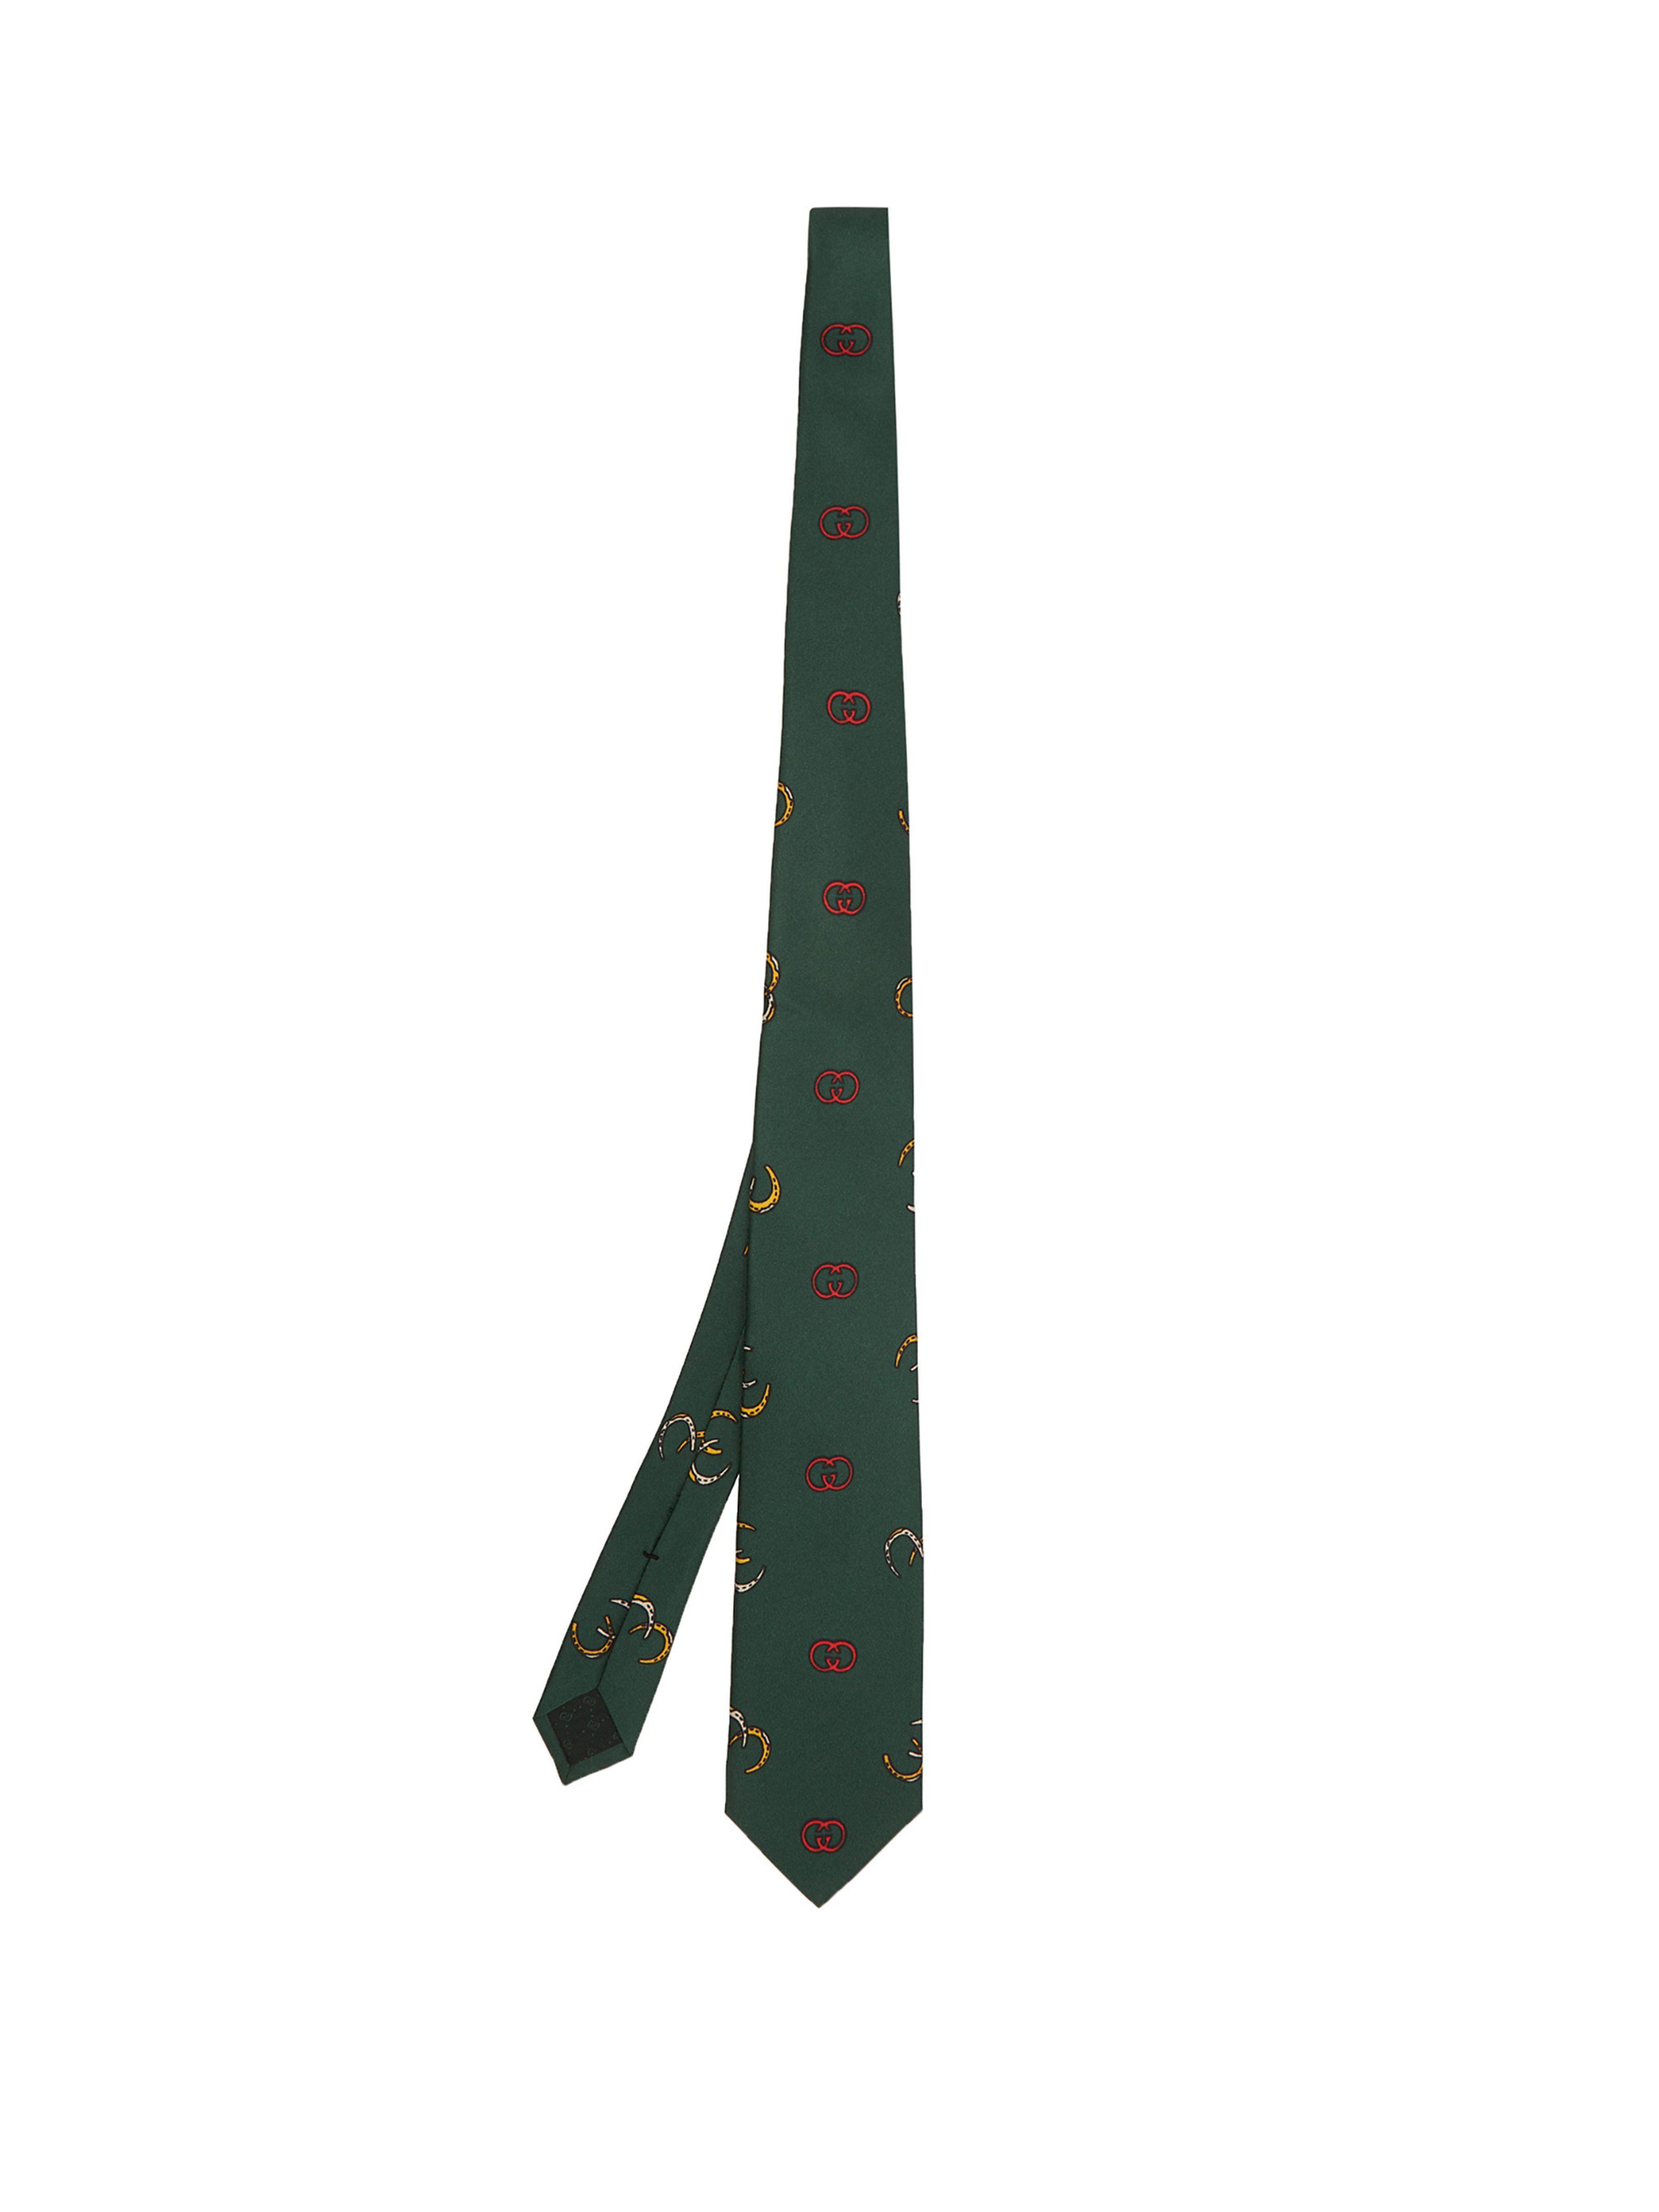 960d10823ed5 Gucci Gg Logo Print Silk Twill Tie in Green for Men - Lyst